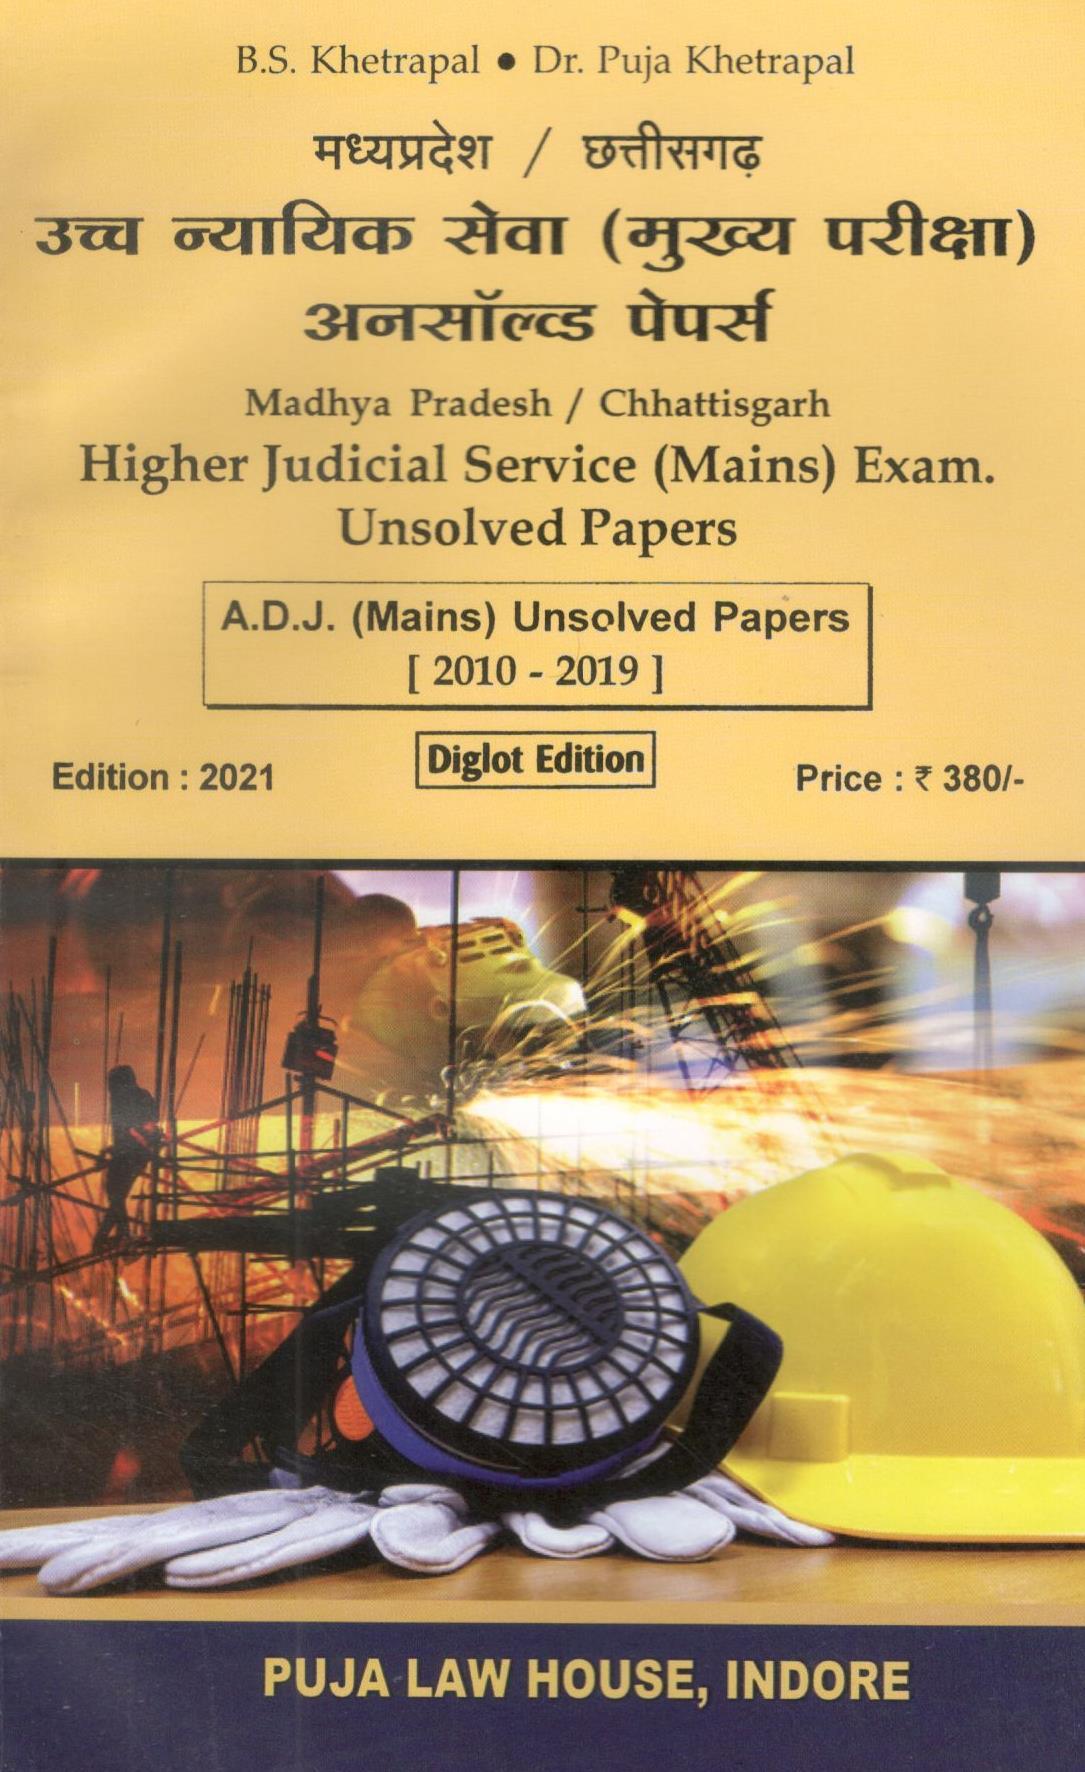 म.प्र./छ.ग. उच्च न्यायिक सेवा (मुख्य परीक्षा) अनसॉल्व्ड पेपर्स - Madhya Pradesh / Chhattisgarh Higher Judicial Service (Mains) Exam. Unsolved Papers (2010-2019)